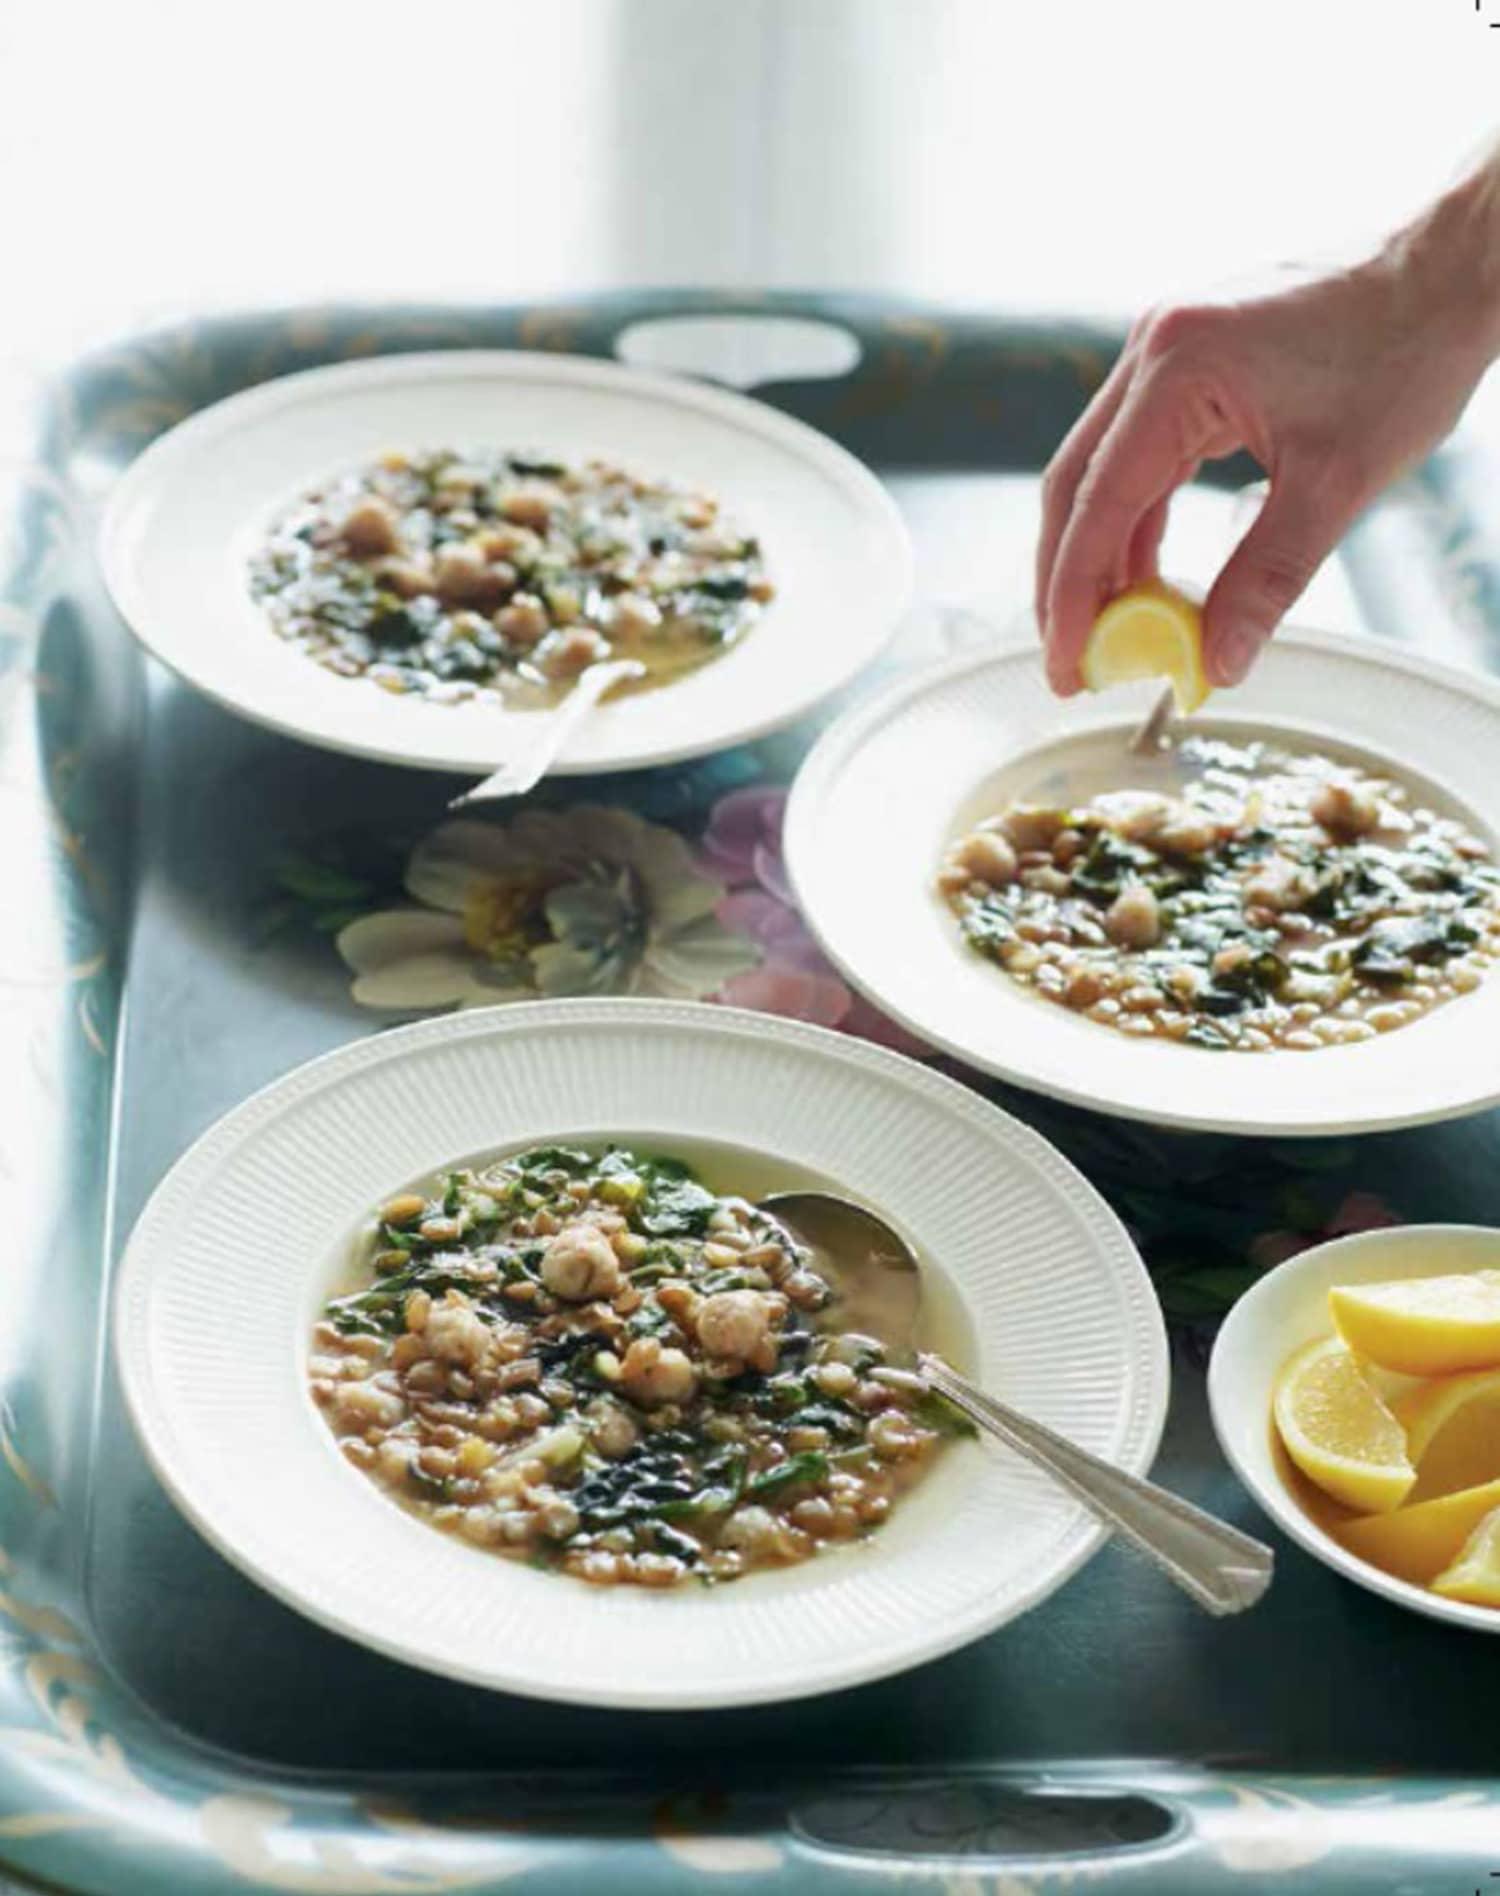 Recipe: Lebanese Lemony Lentil & Swiss Chard Soup (Kibbet Raheb)